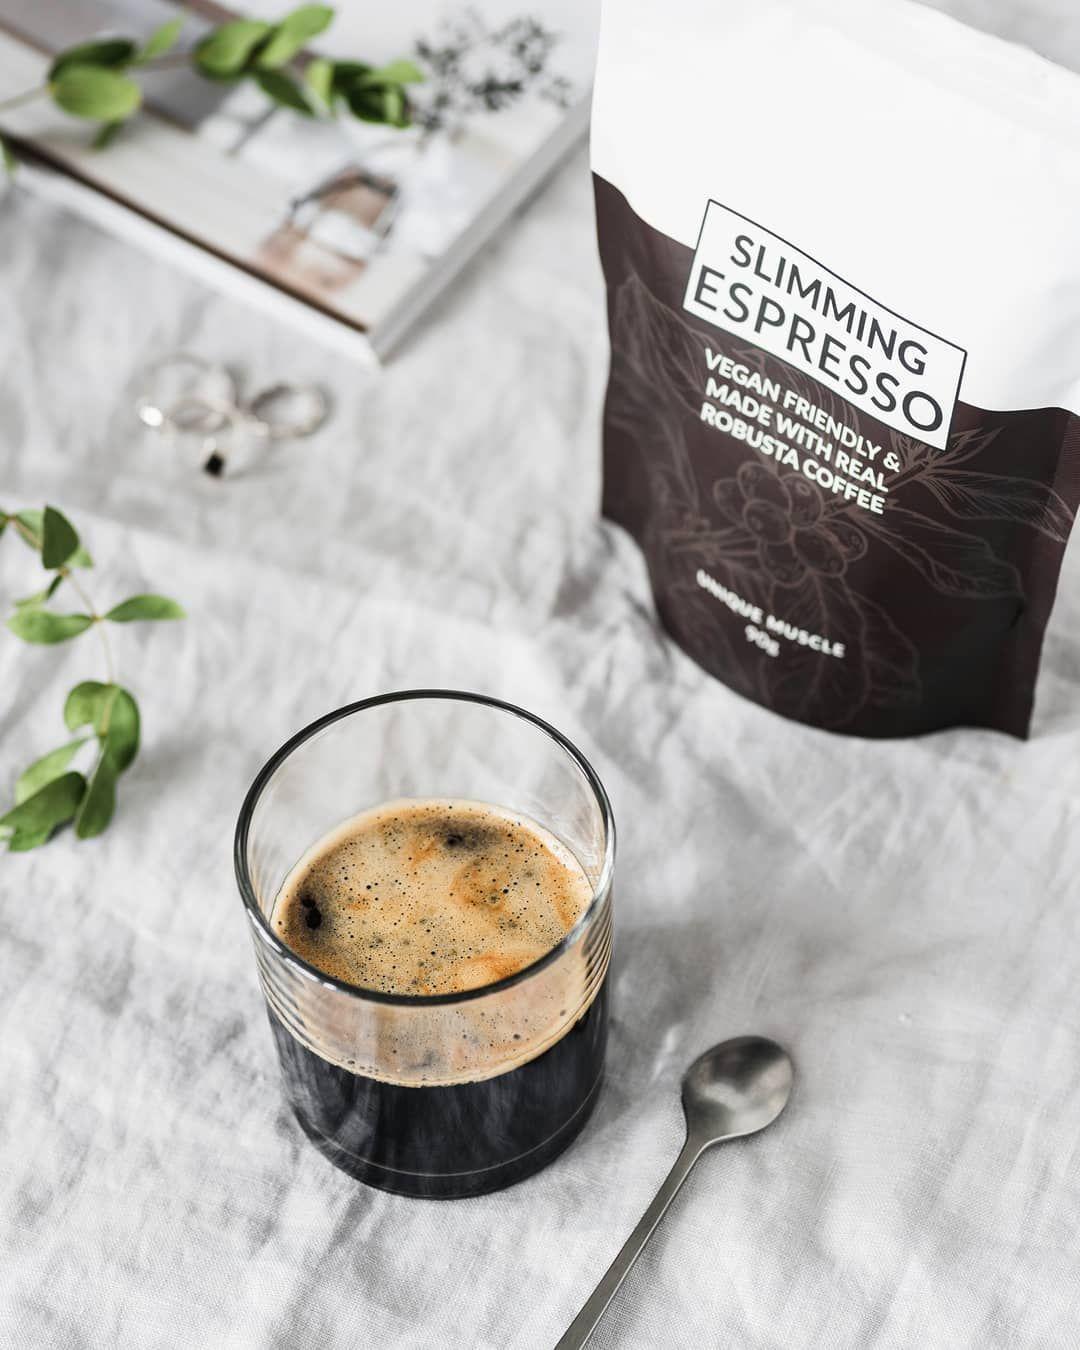 Slimming Espresso Blended coffee, Espresso, Green coffee